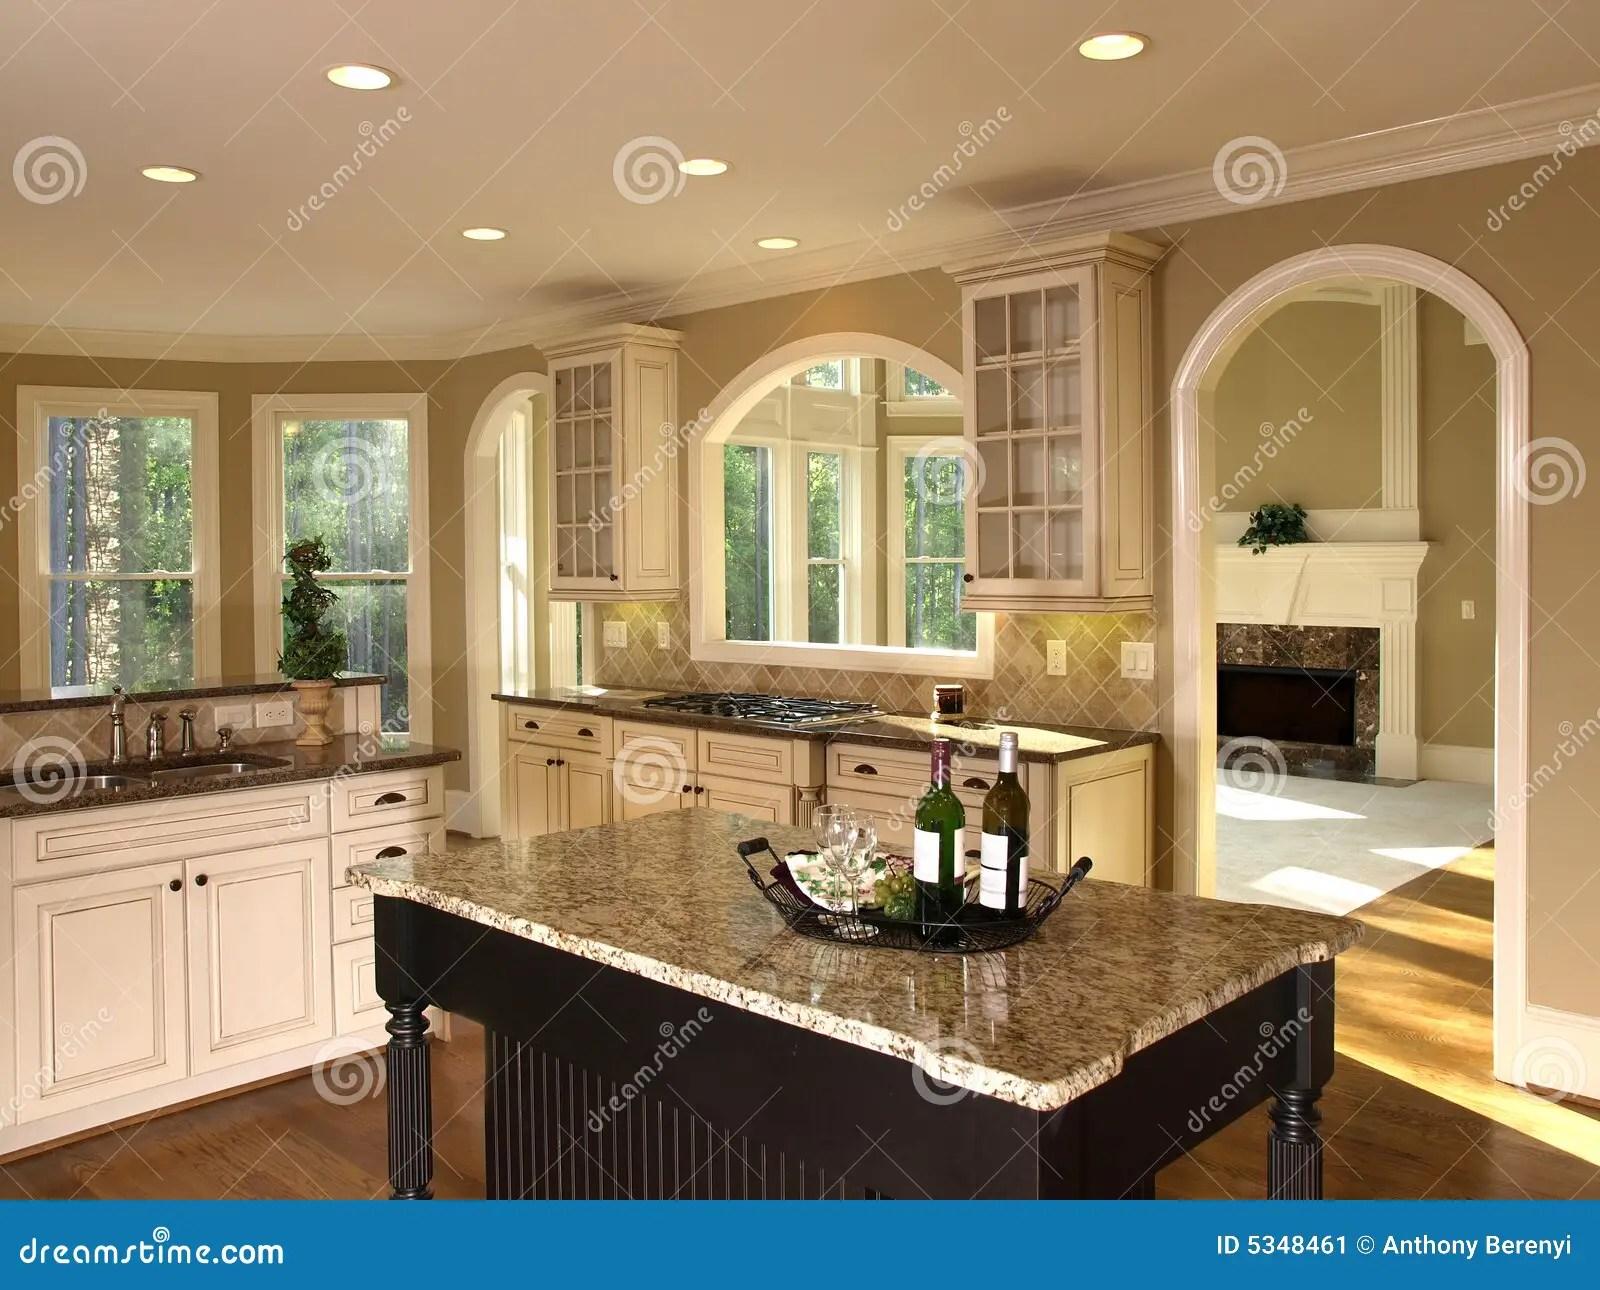 Luxury Model Home Kitchen Island Stock Image Image 5348461